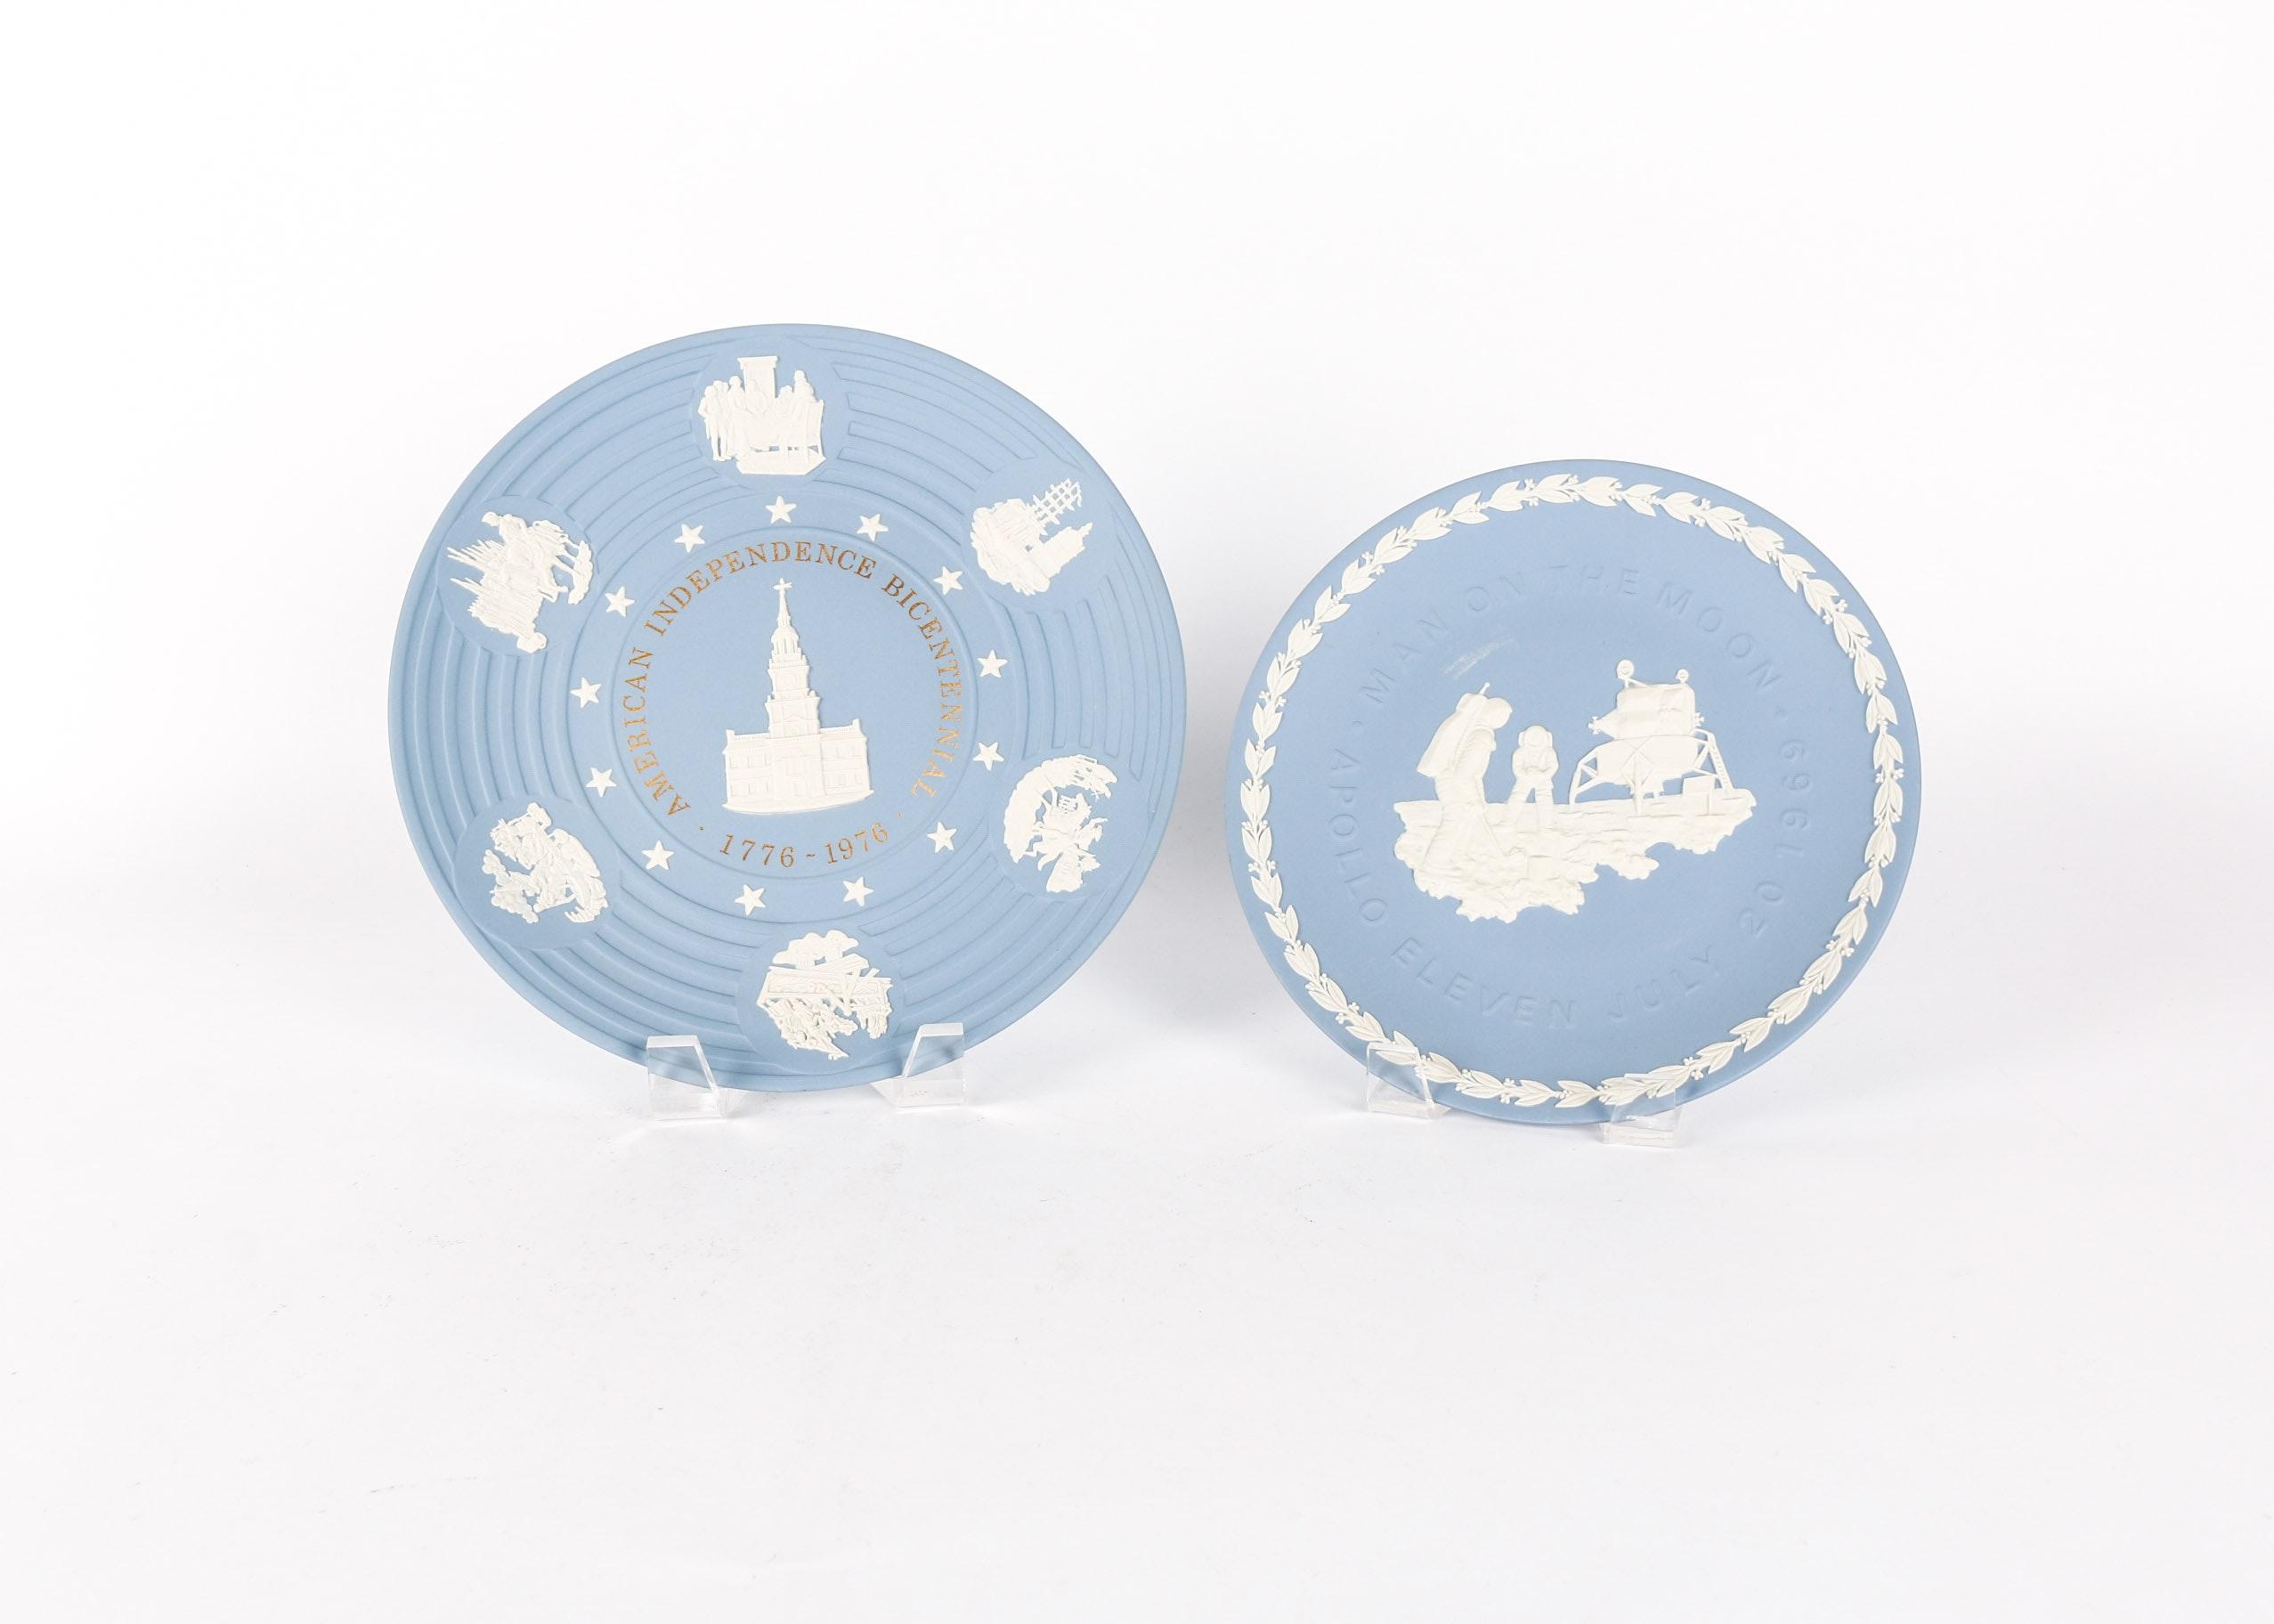 Vintage Wedgwood Americana Plates